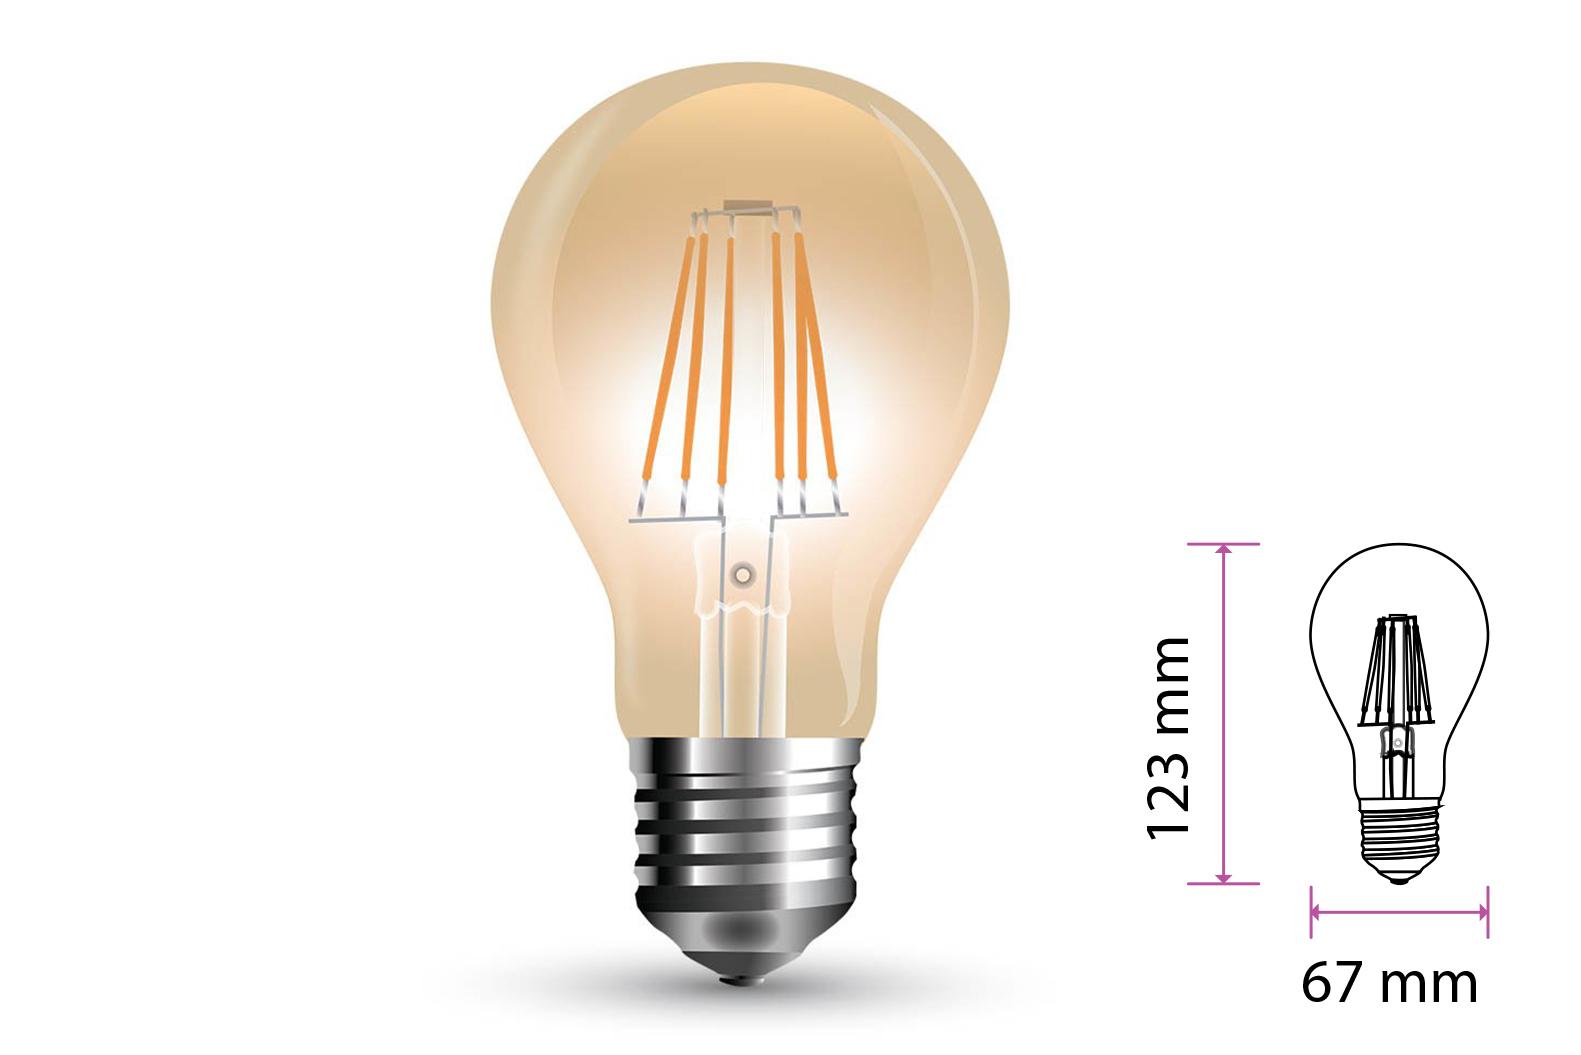 Lampada Filo Led a Filamento E27 10W A67 Bianco Caldo 2200K Cover Amber SKU-7157 - PZ